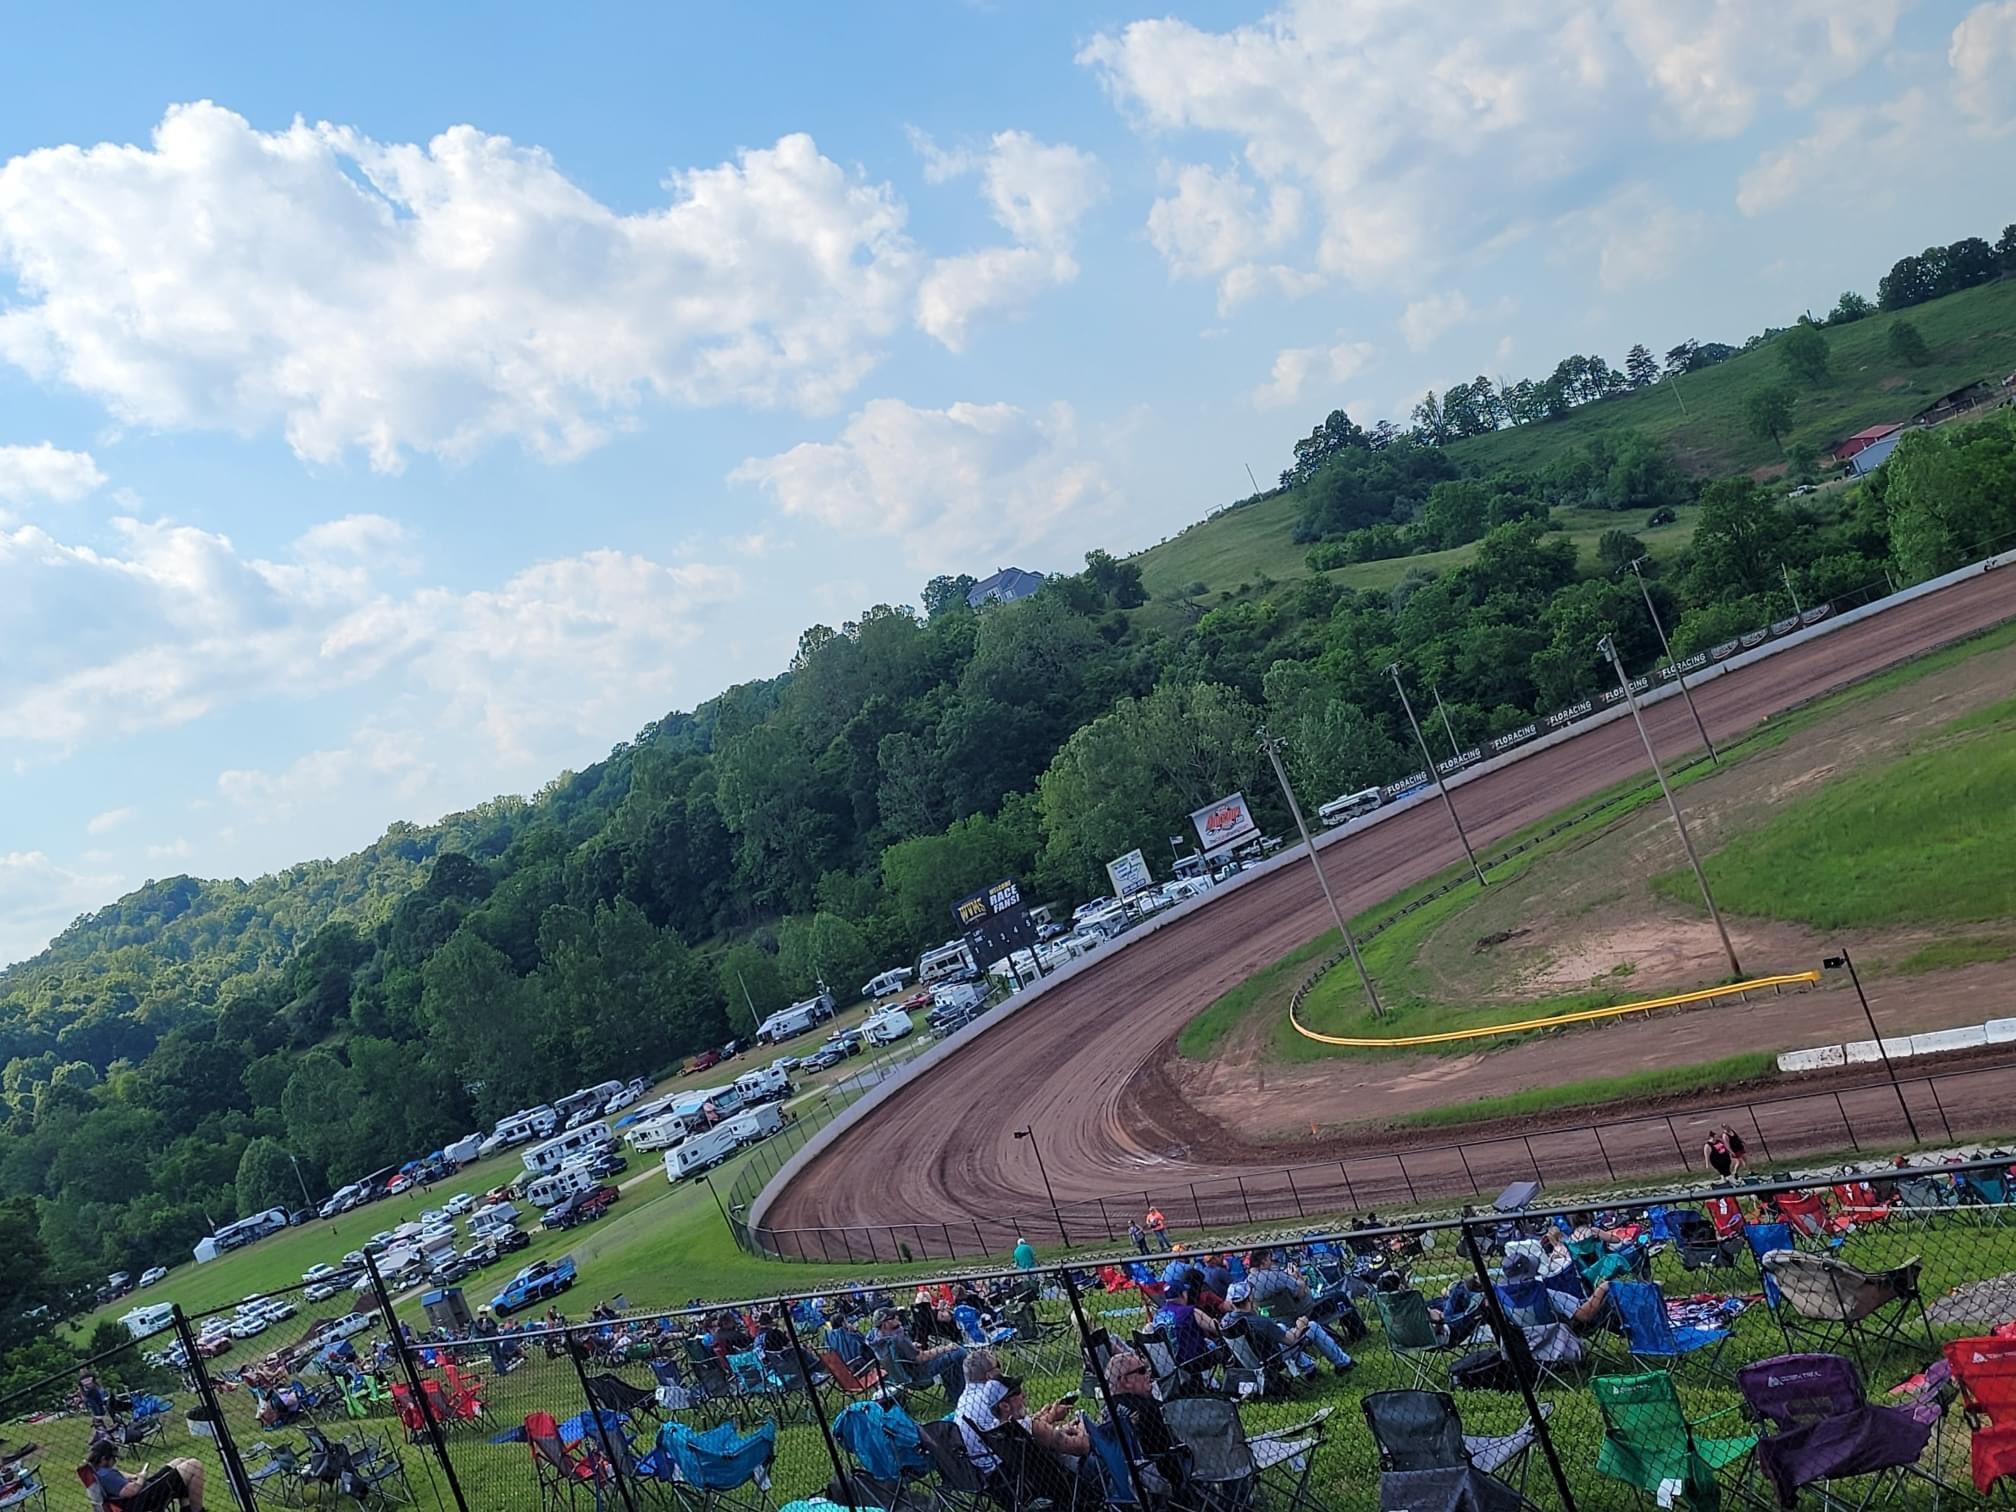 WVMS Dirt Track - West Virginia Motor Speedway